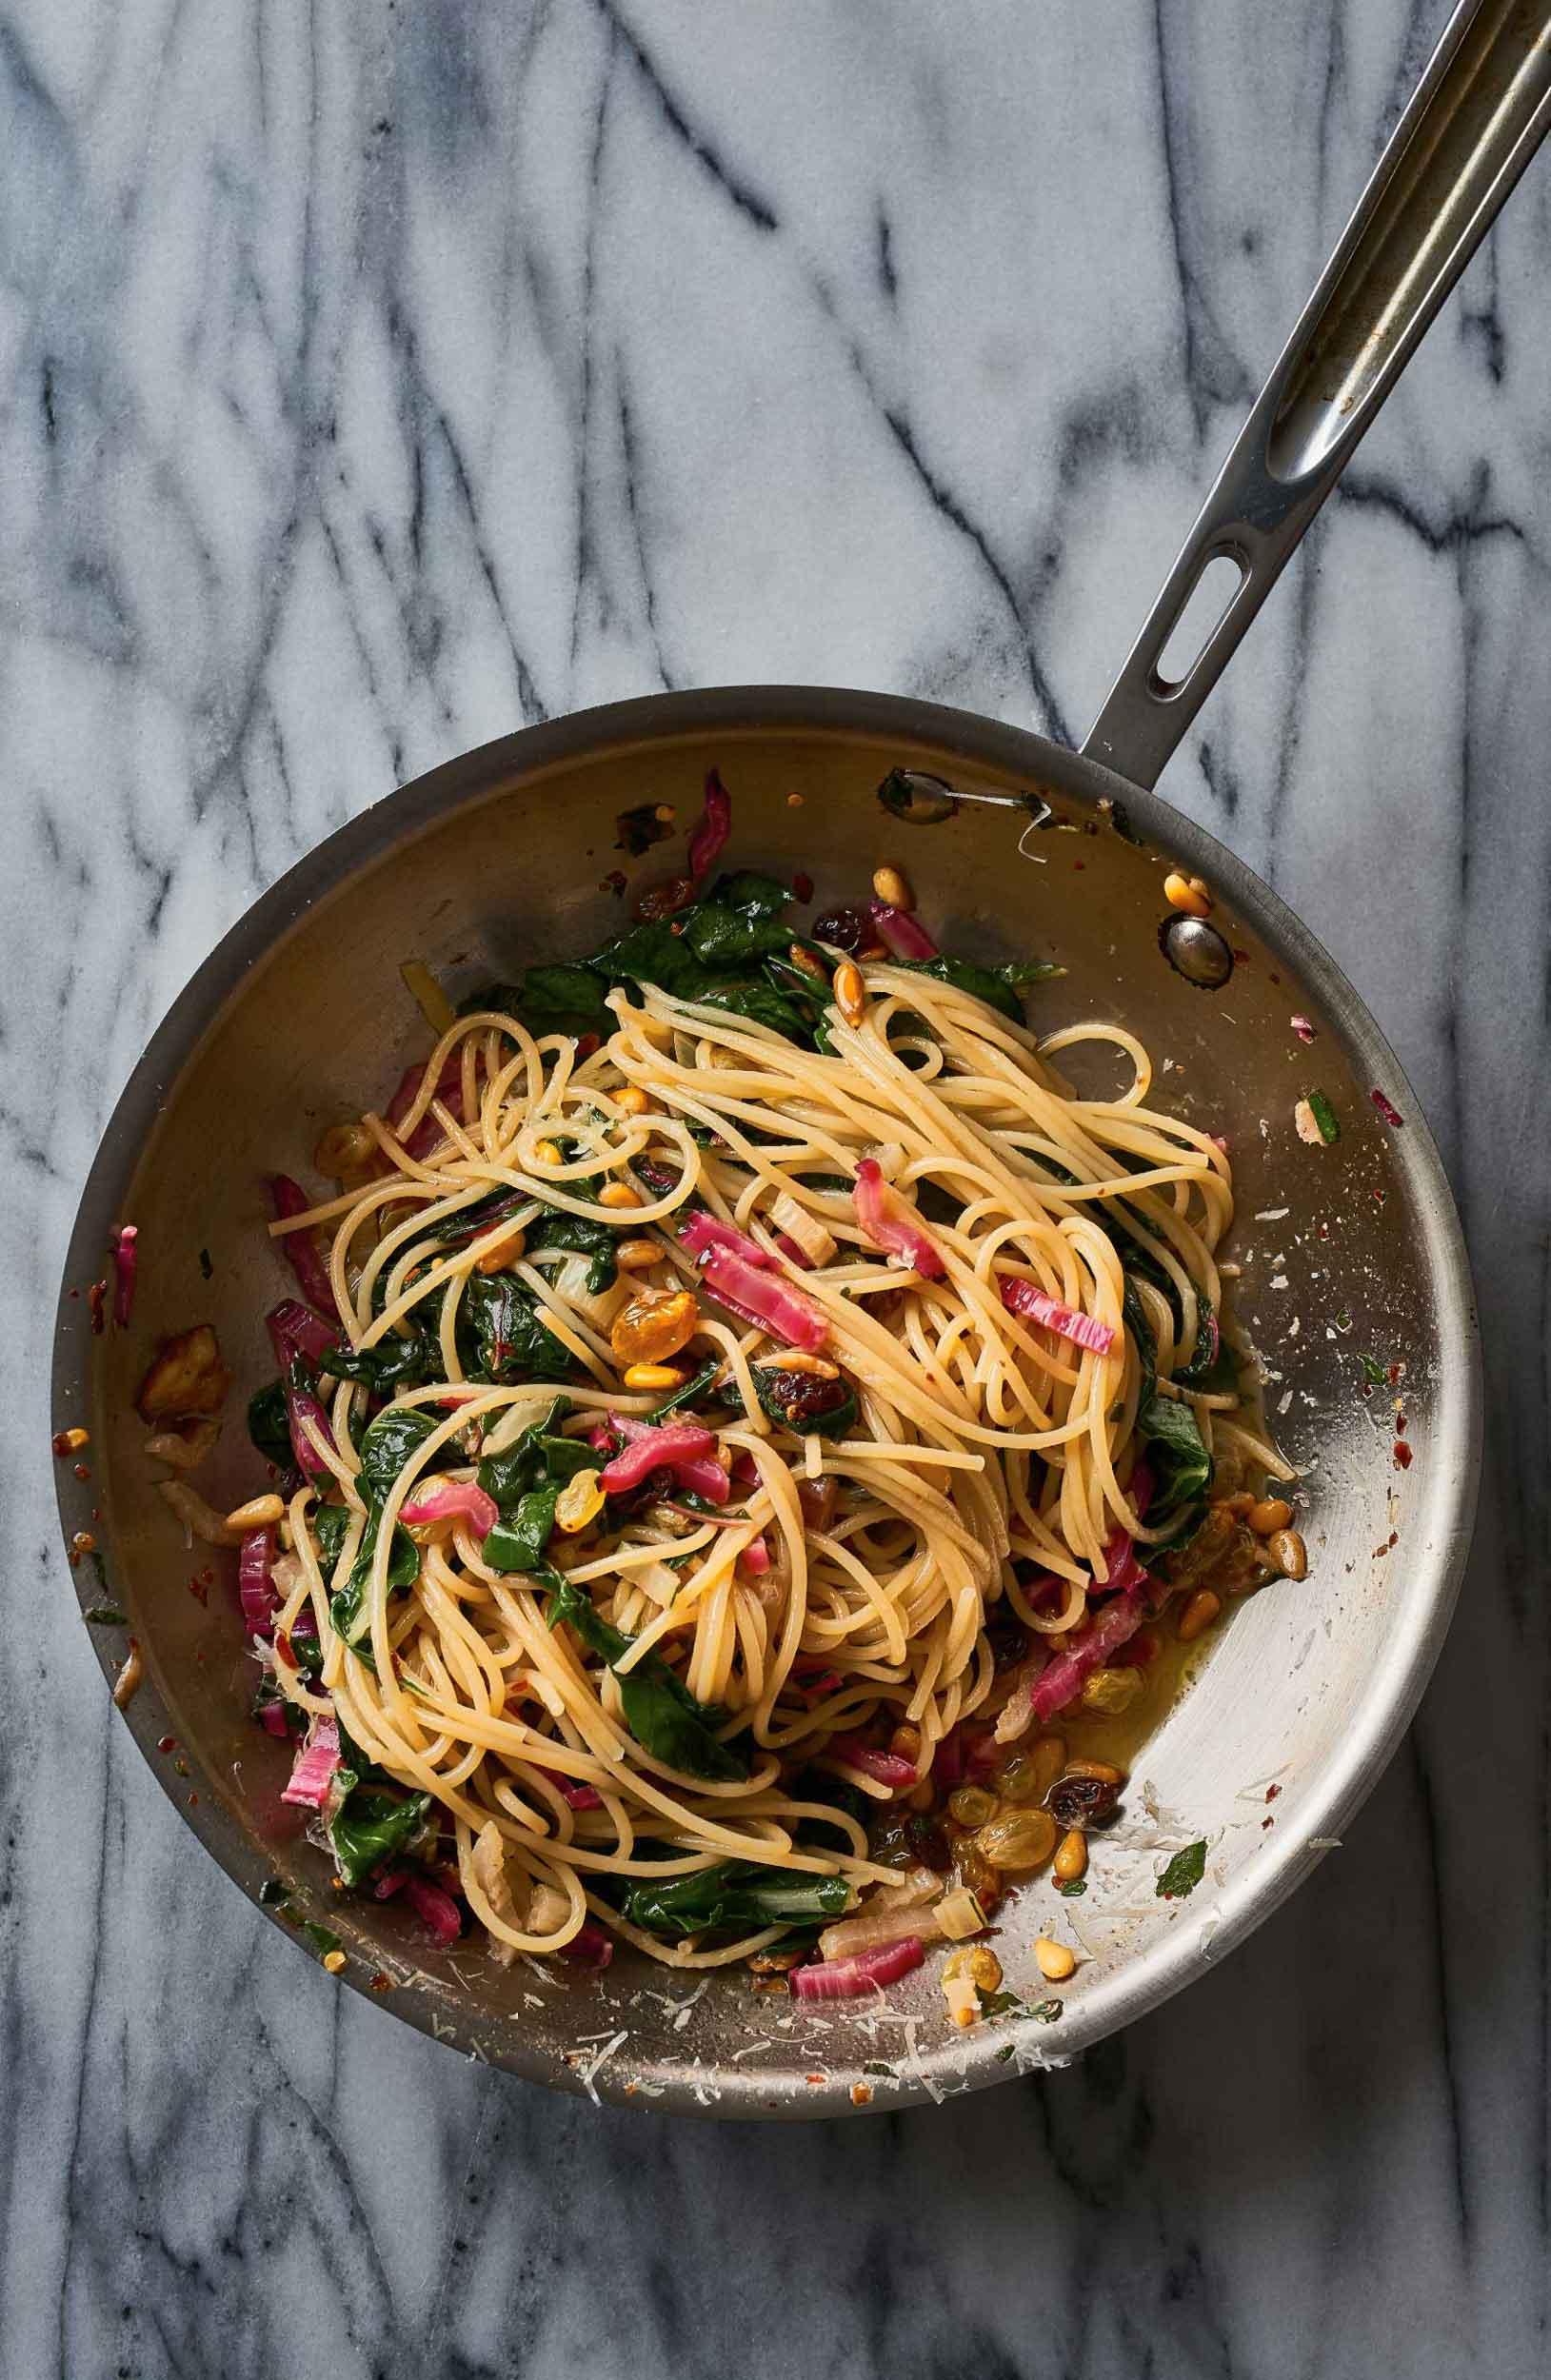 Spaghetti-w-swiss-chard-pine-nuts-raisins-and-chilies_32.jpg